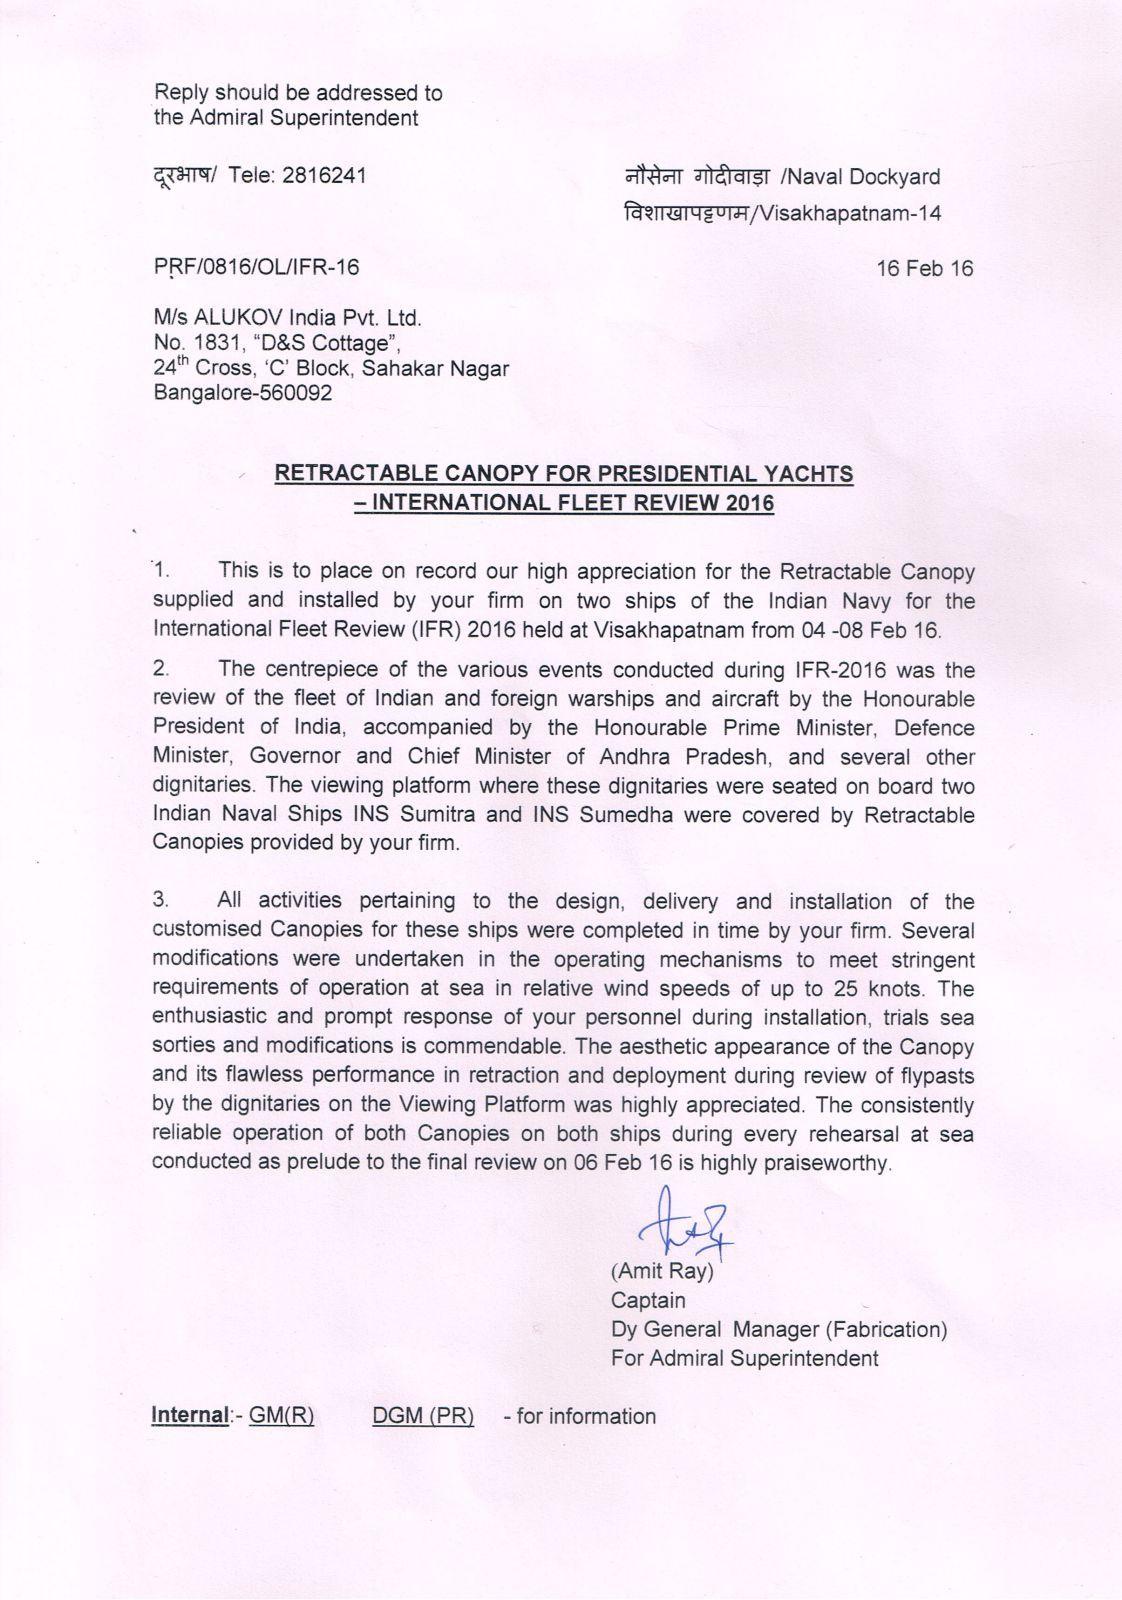 INDIAN NAVY APPRECIATION LETTER Appreciation letter